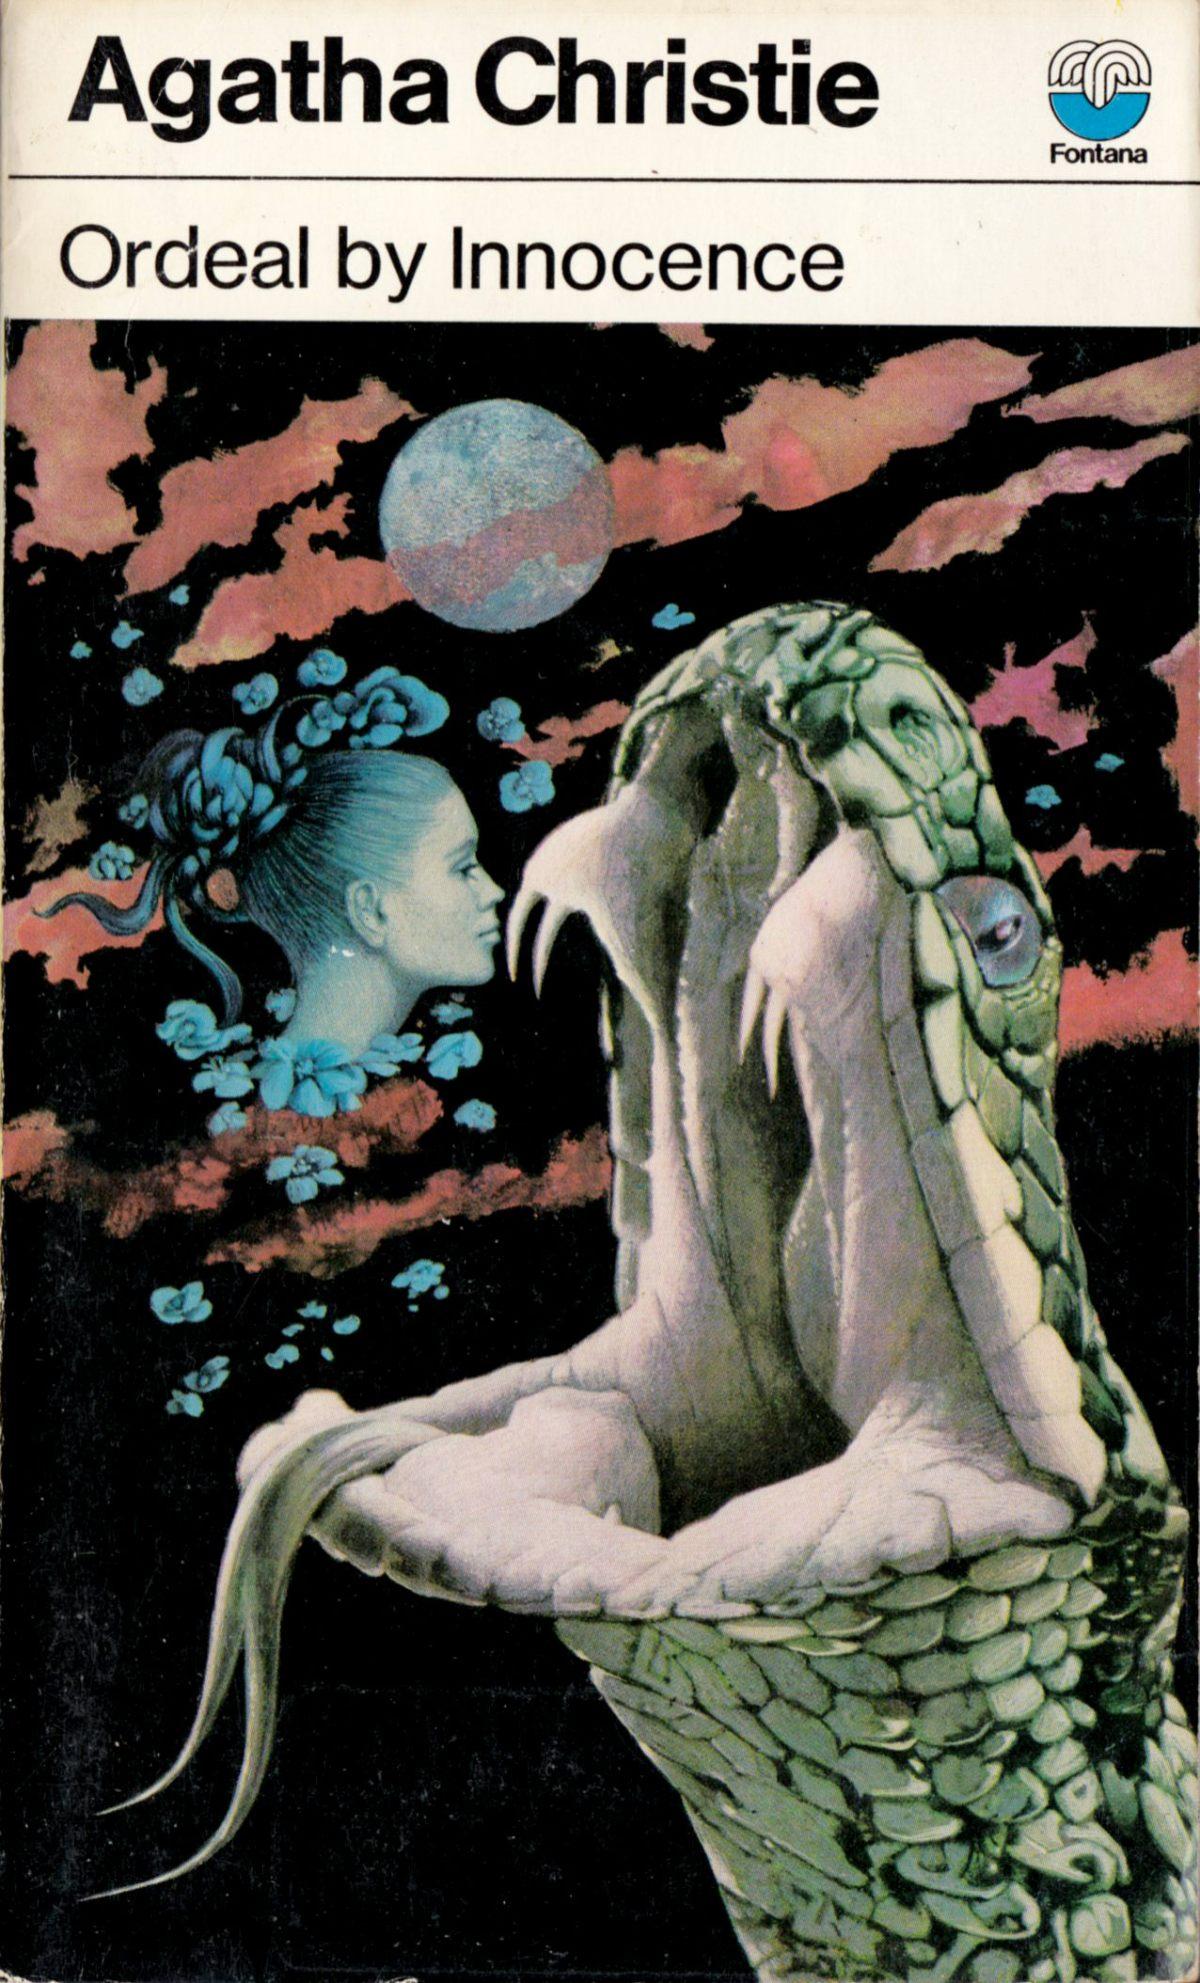 Agatha Christie Tom Adams Ordeal By Innocence Fontana 1975